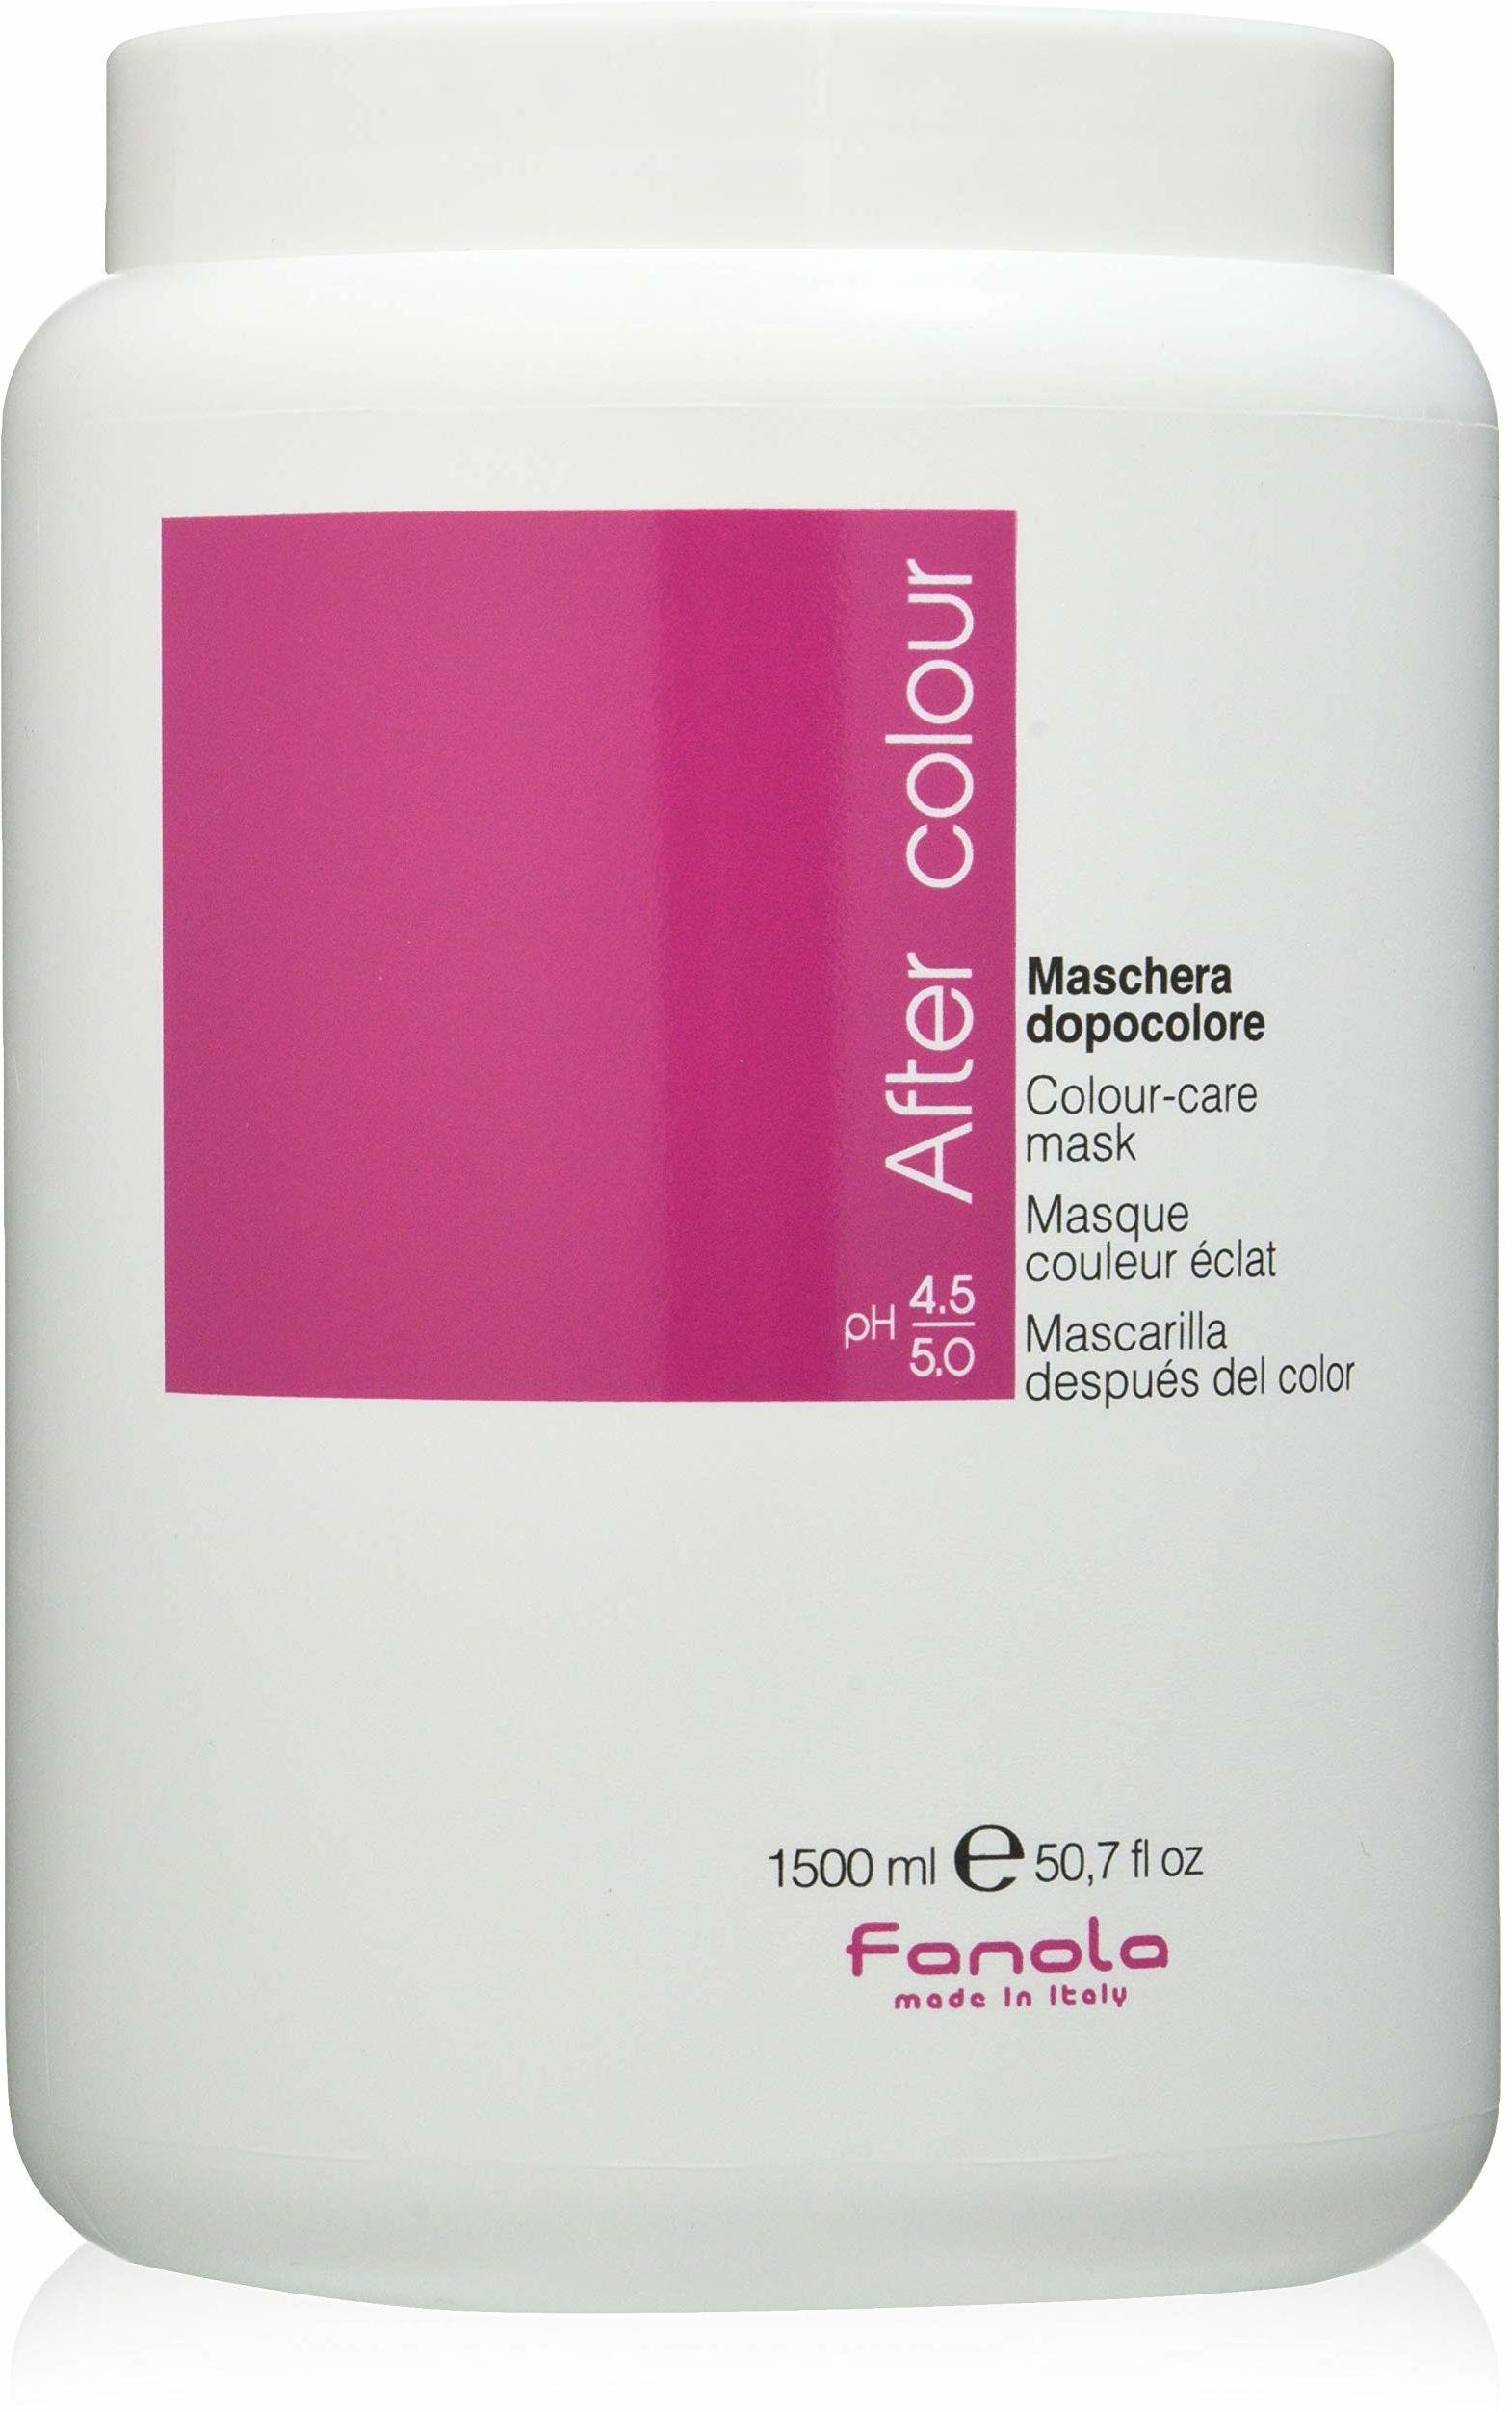 Fanola After Colour Maschera dopocolore 1500 ml